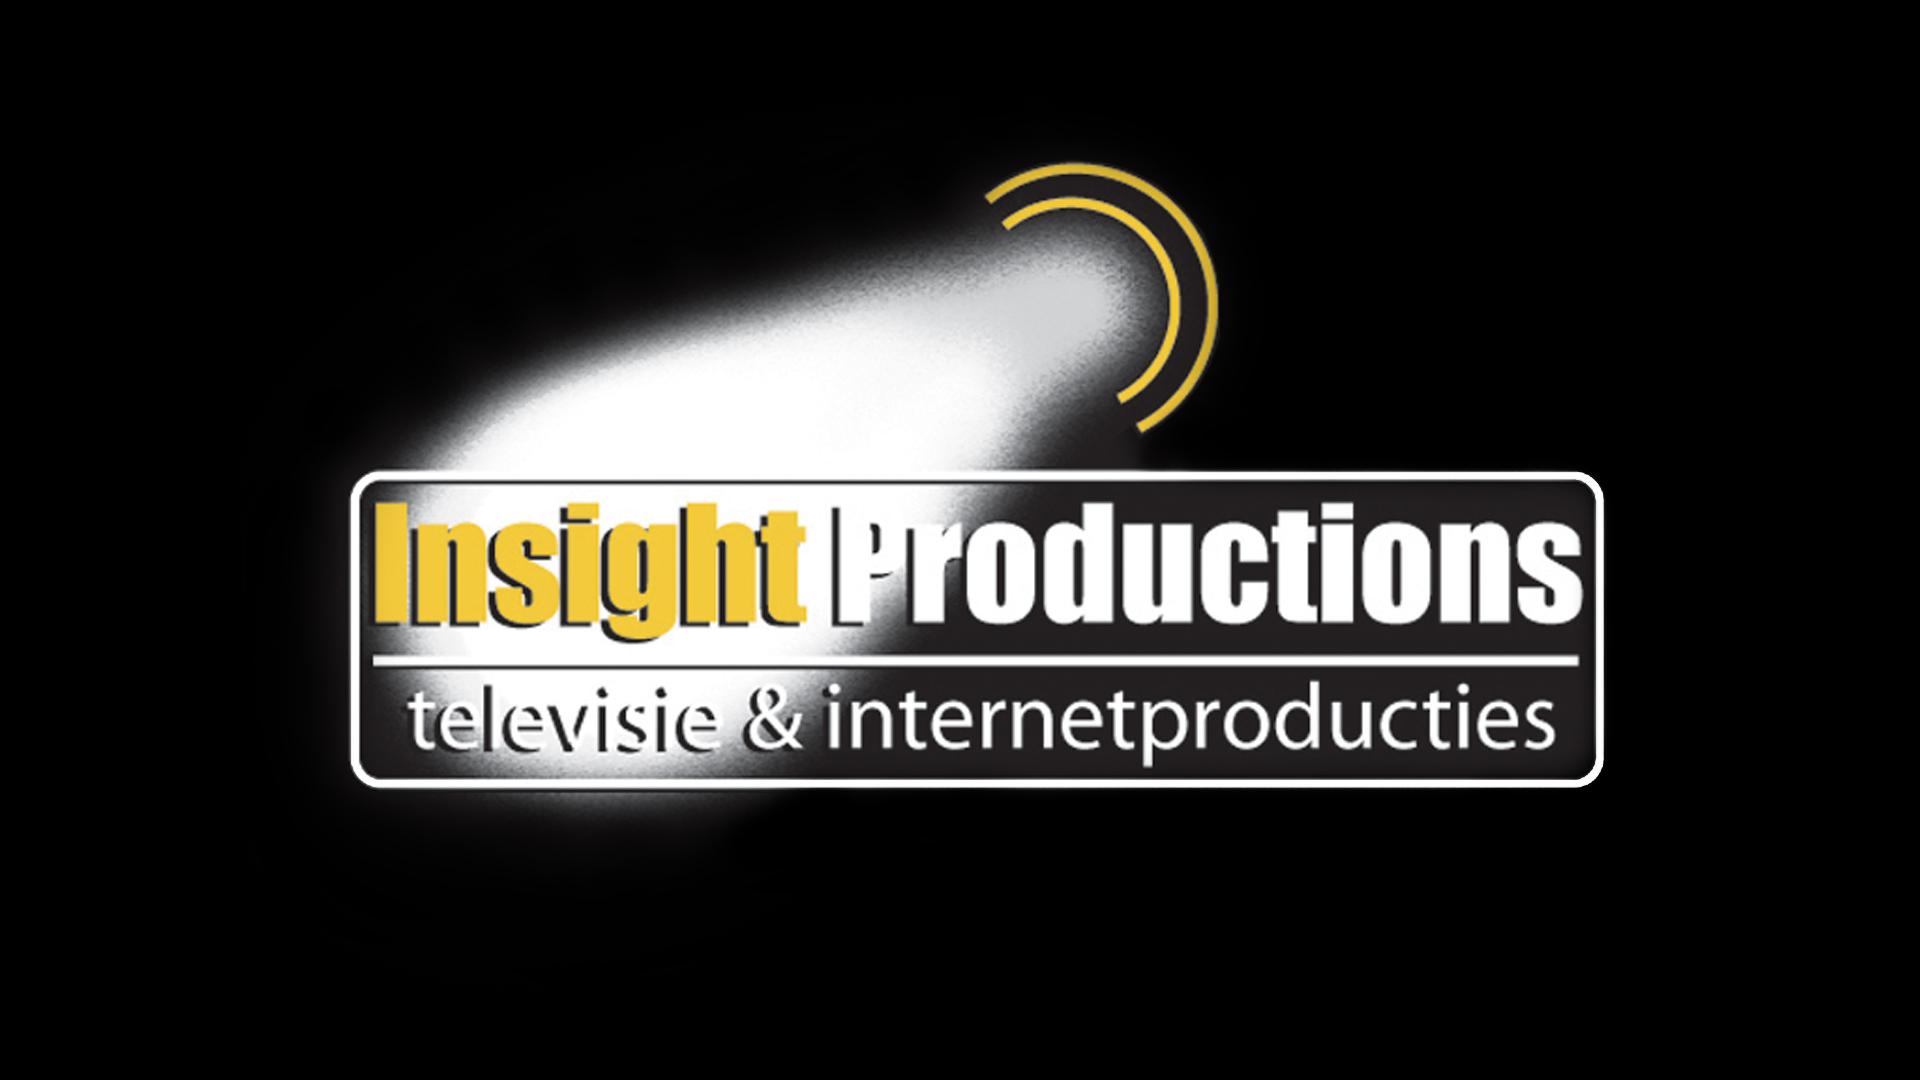 LOGO-INSIGHT-PRODUCTIONS-zwart